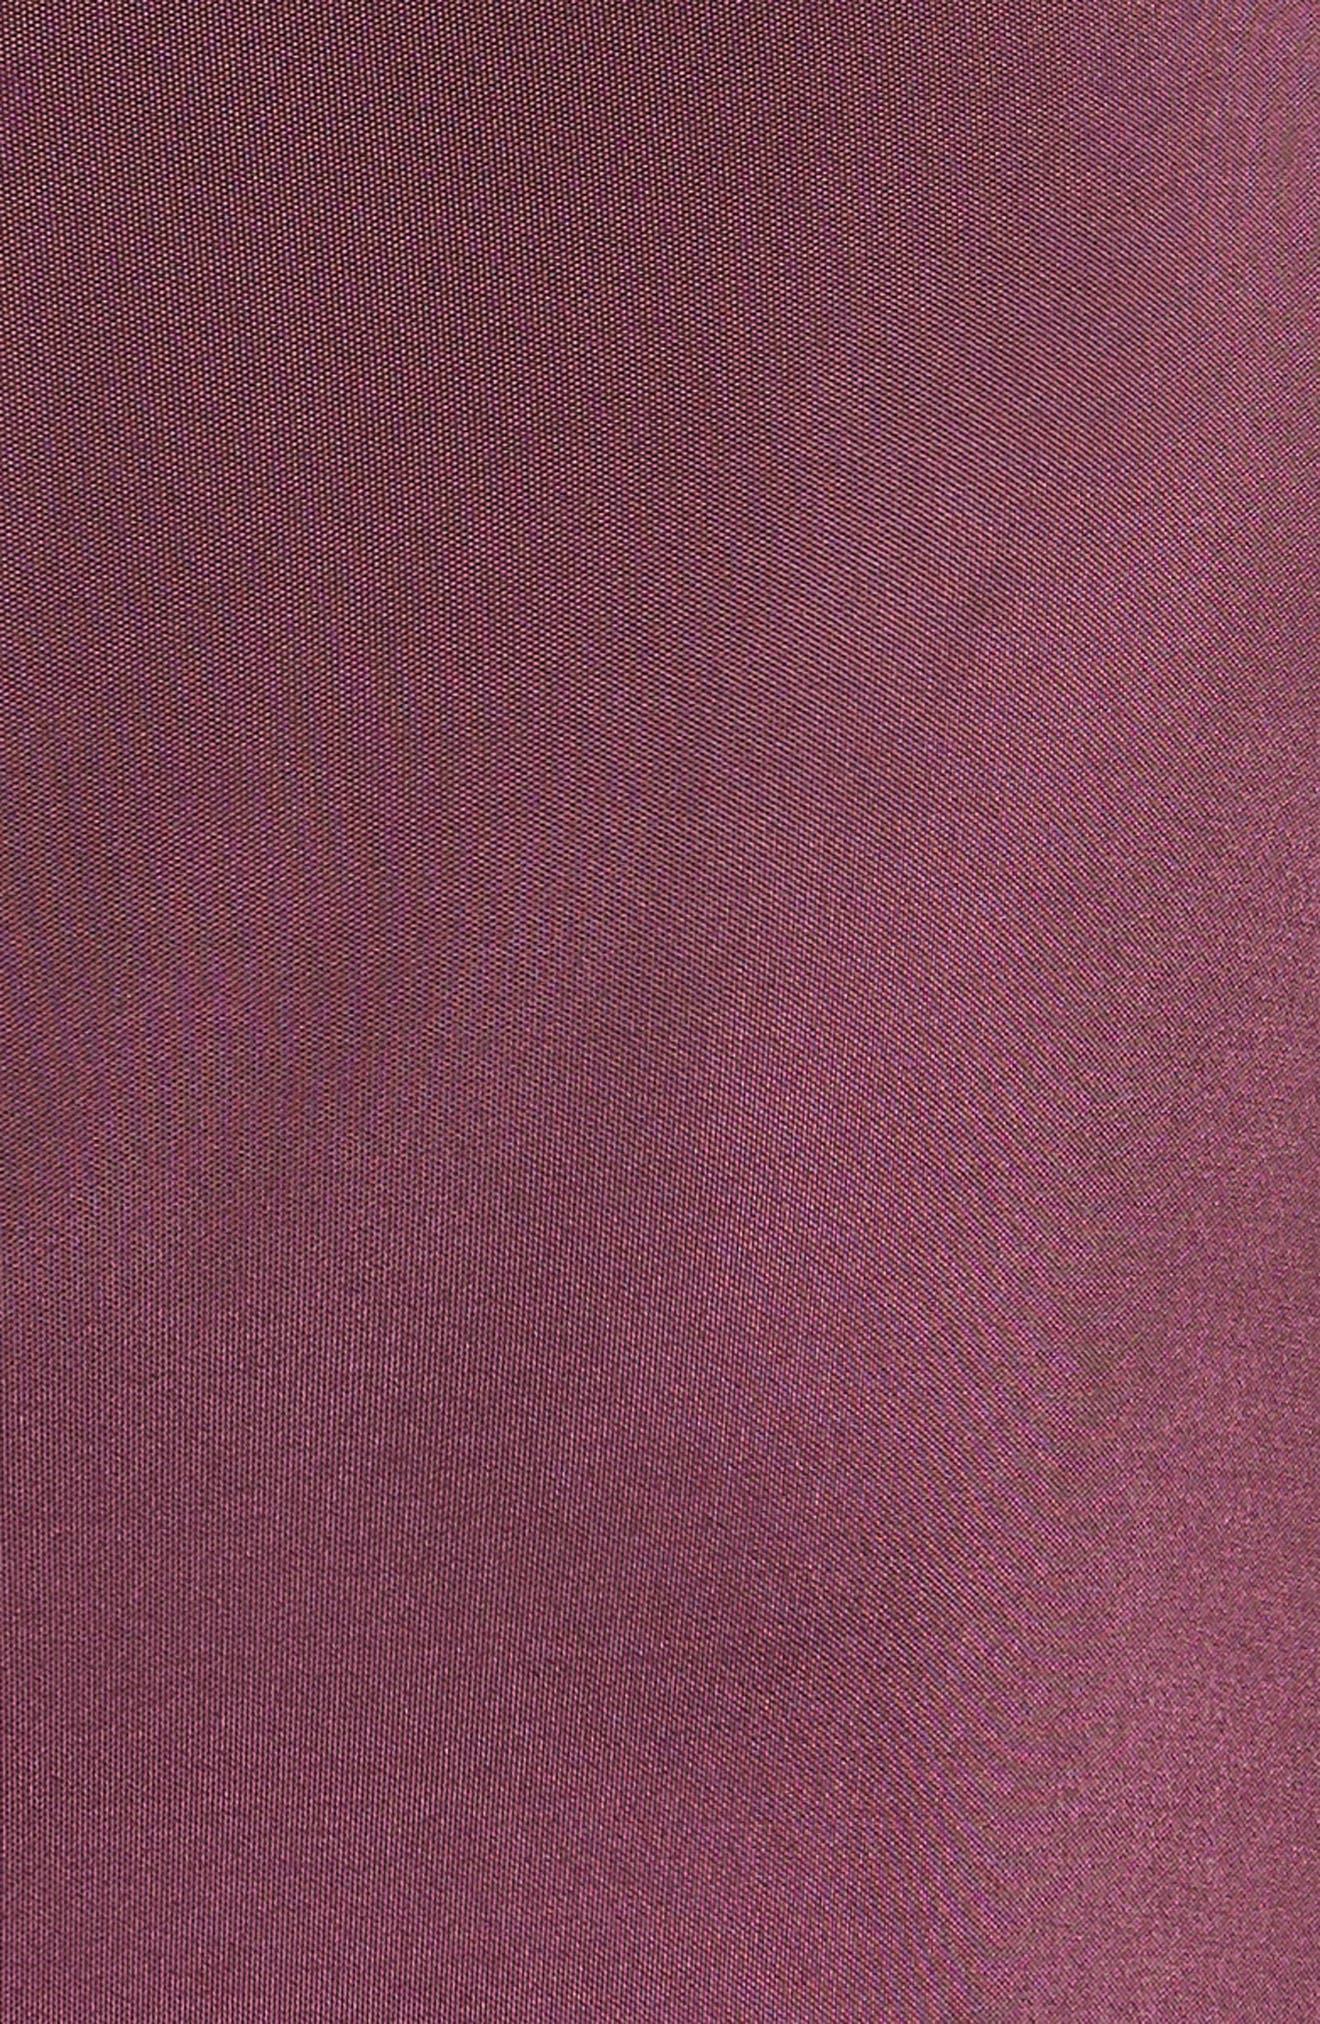 Twisted Jersey One-Shoulder Dress,                             Alternate thumbnail 5, color,                             540